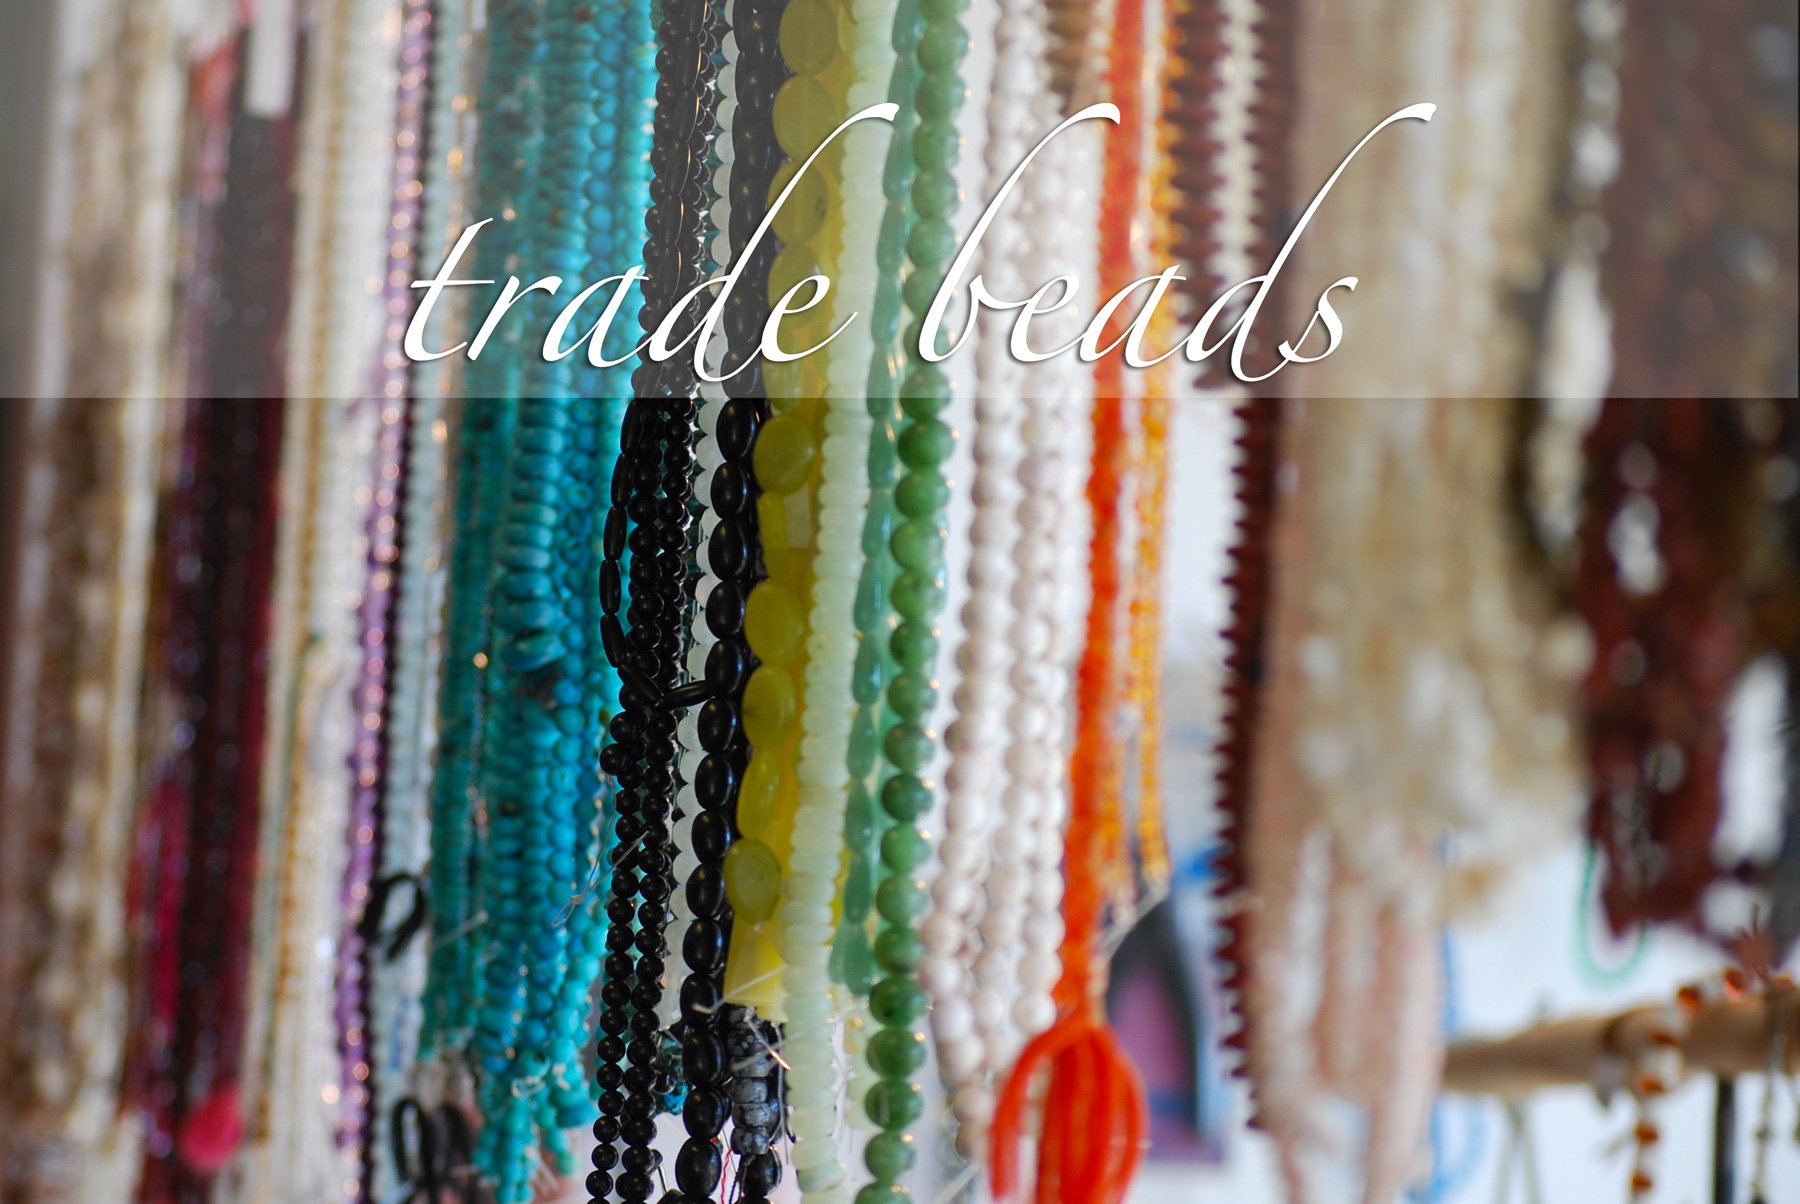 cpal-slide-show-hanging-beads-in-shop-2-revisedA.jpg